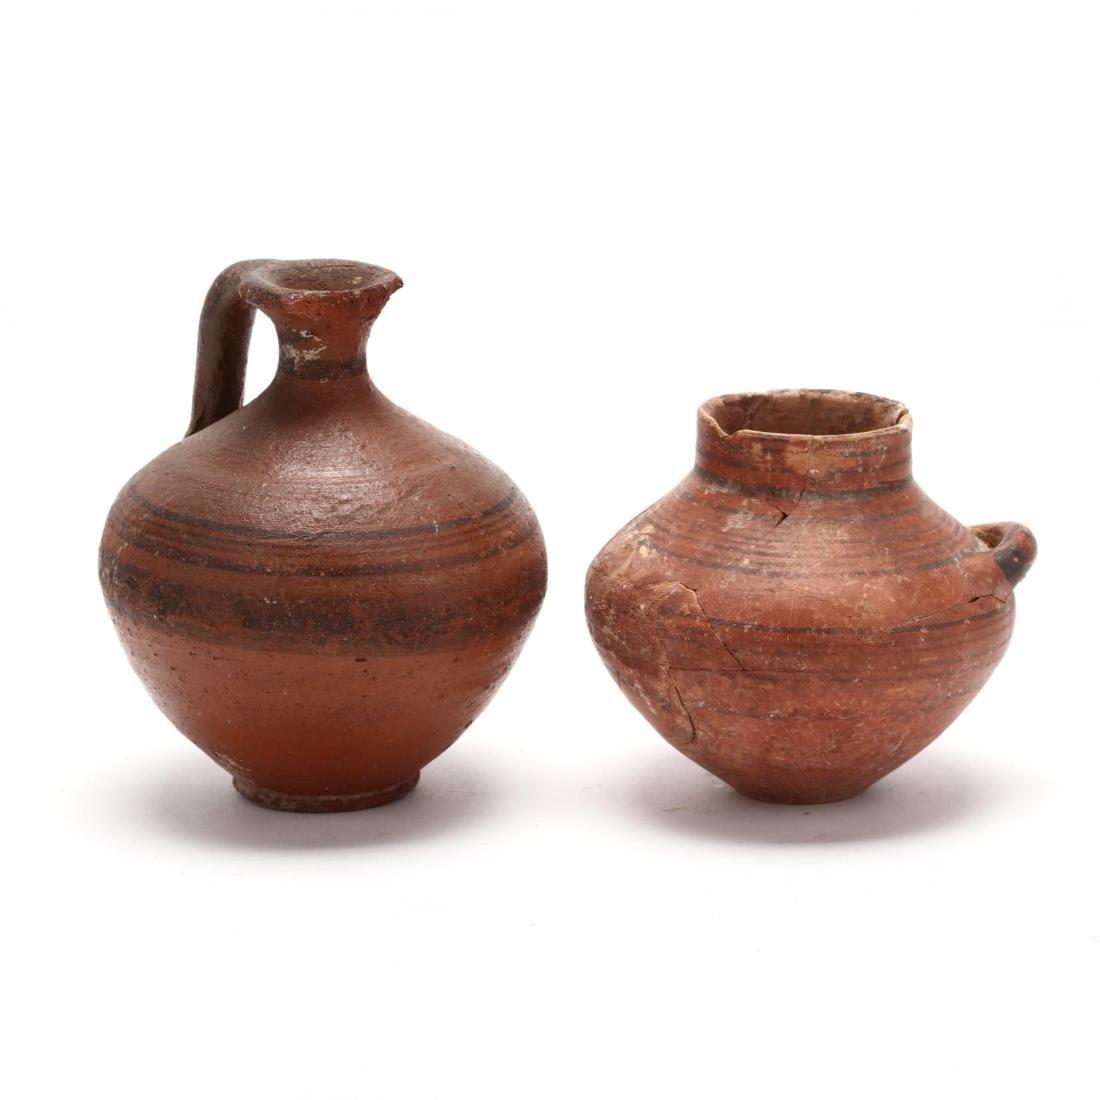 Two Cypro-Geometric Red Ware Jars